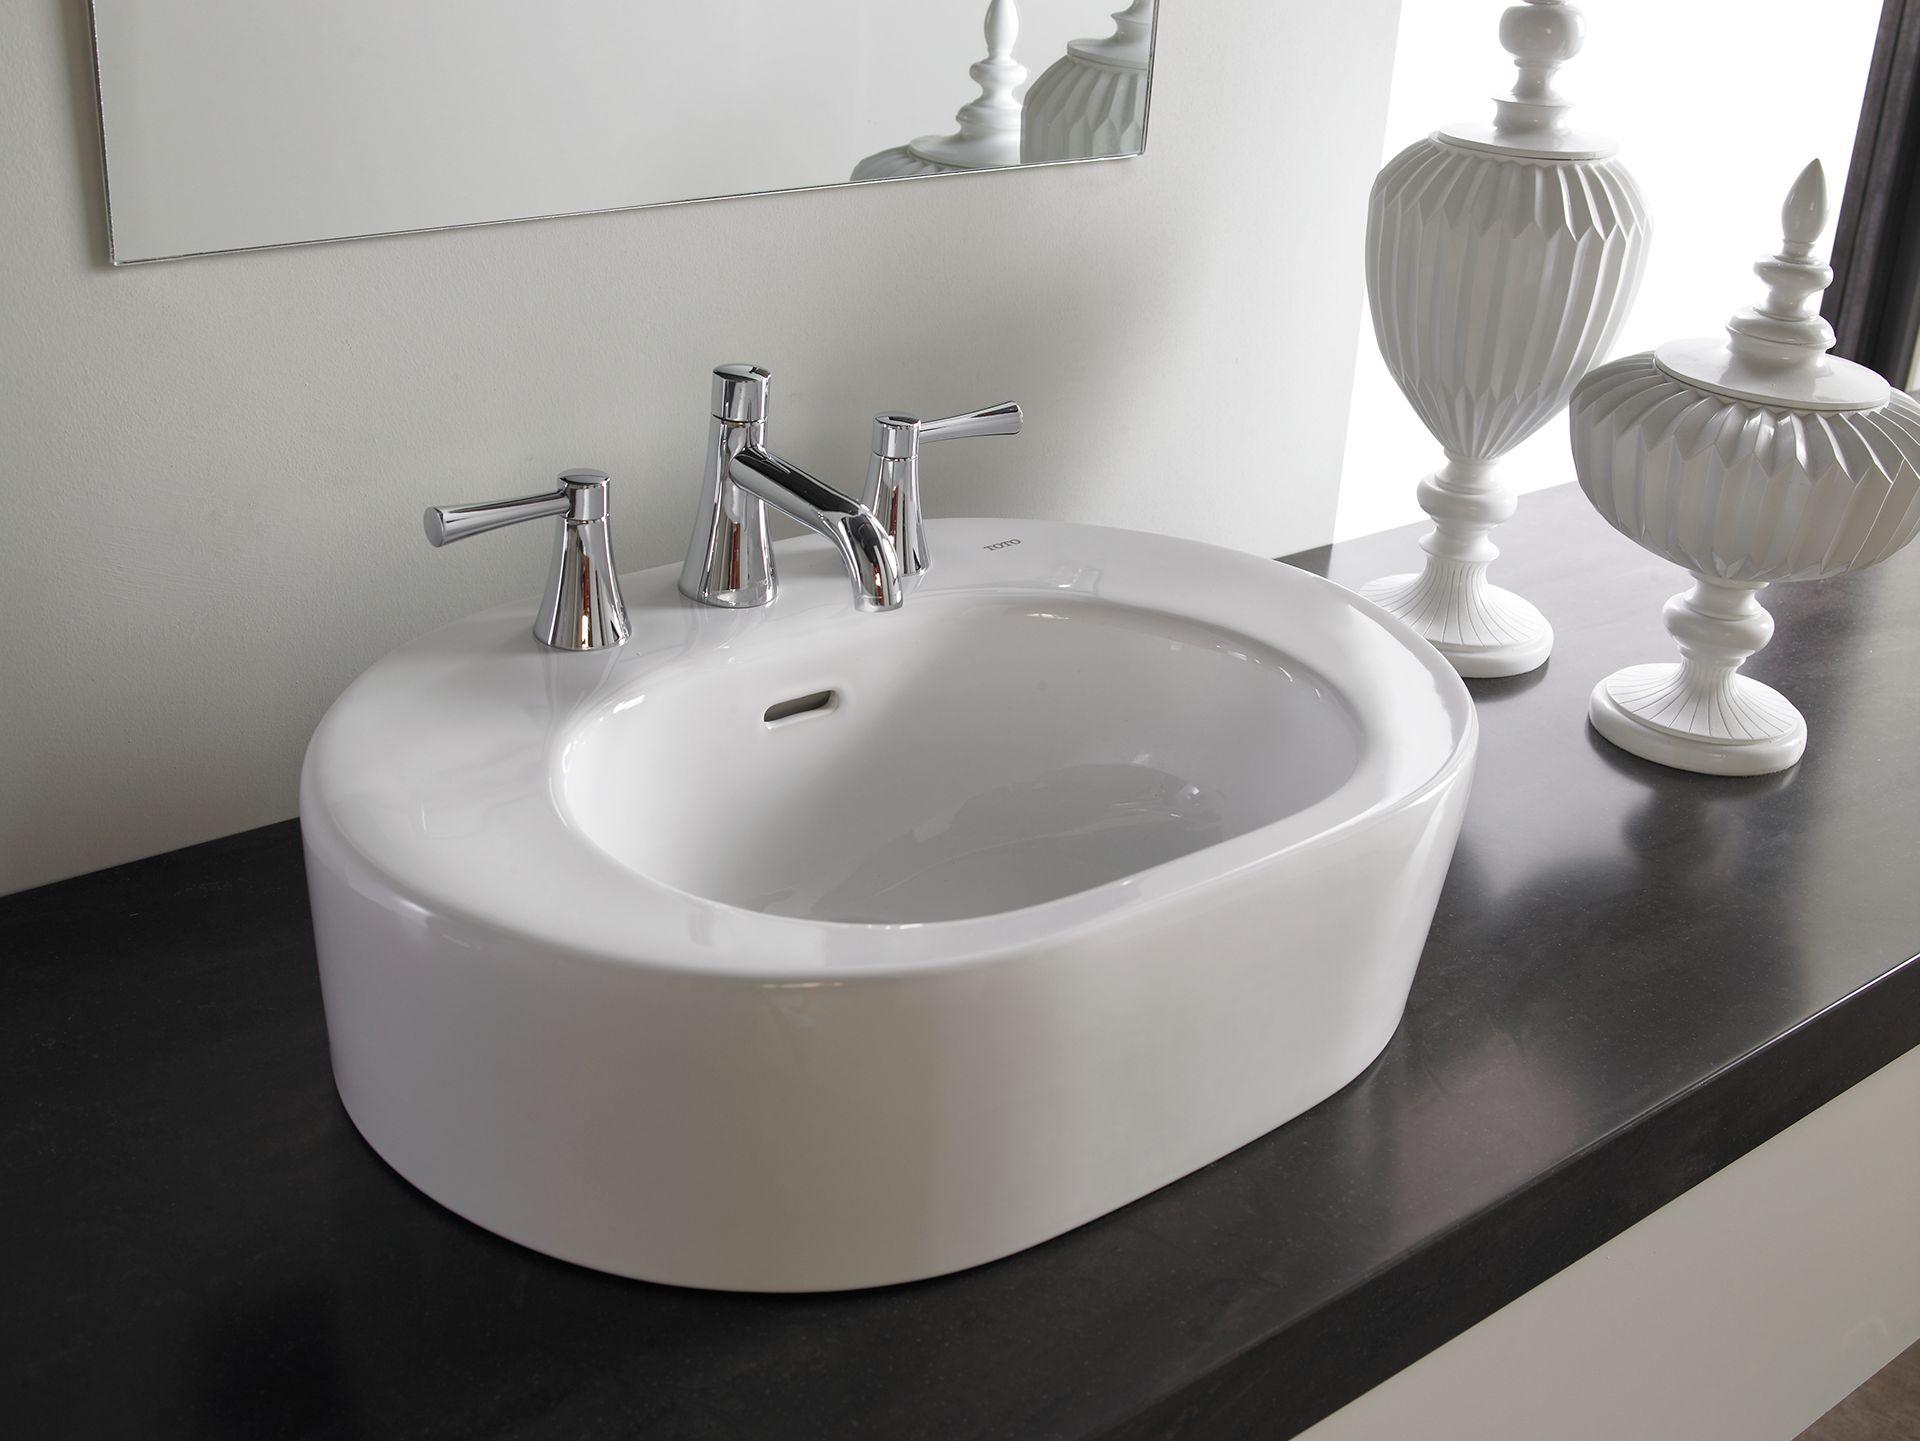 Nexus® Vessel Lavatory - TotoUSA.com